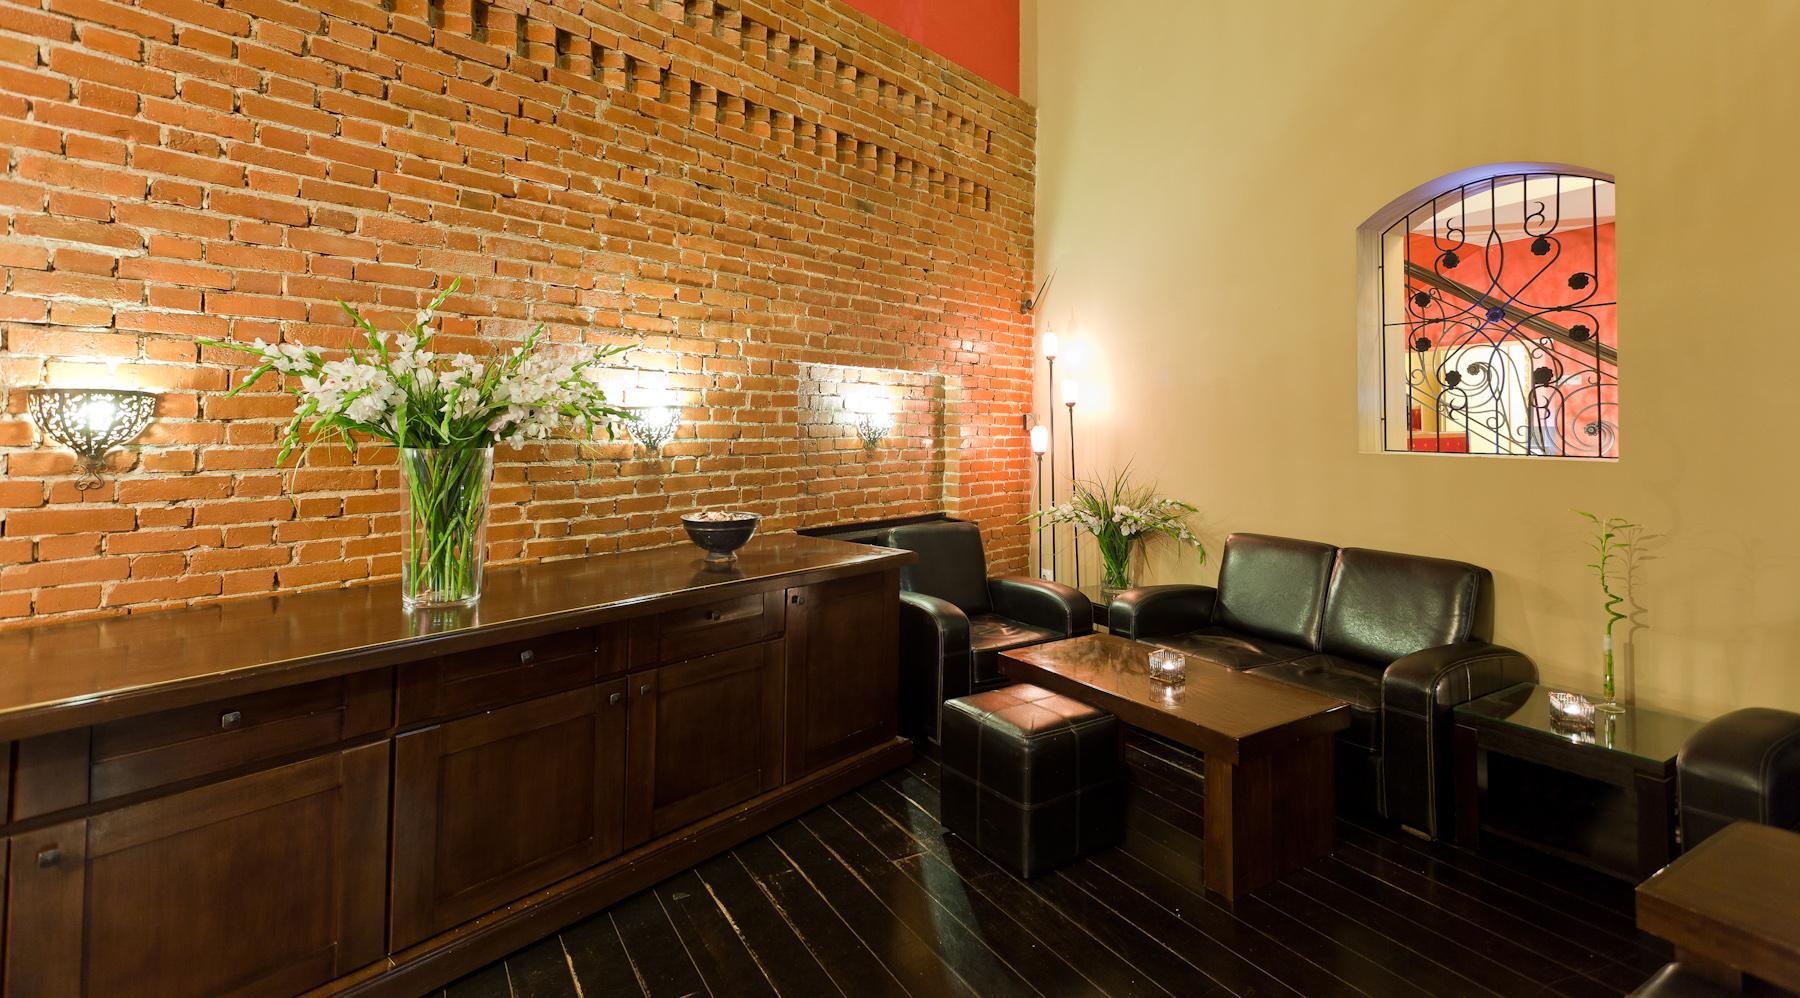 Hotel Moxa Restaurant & Lounge